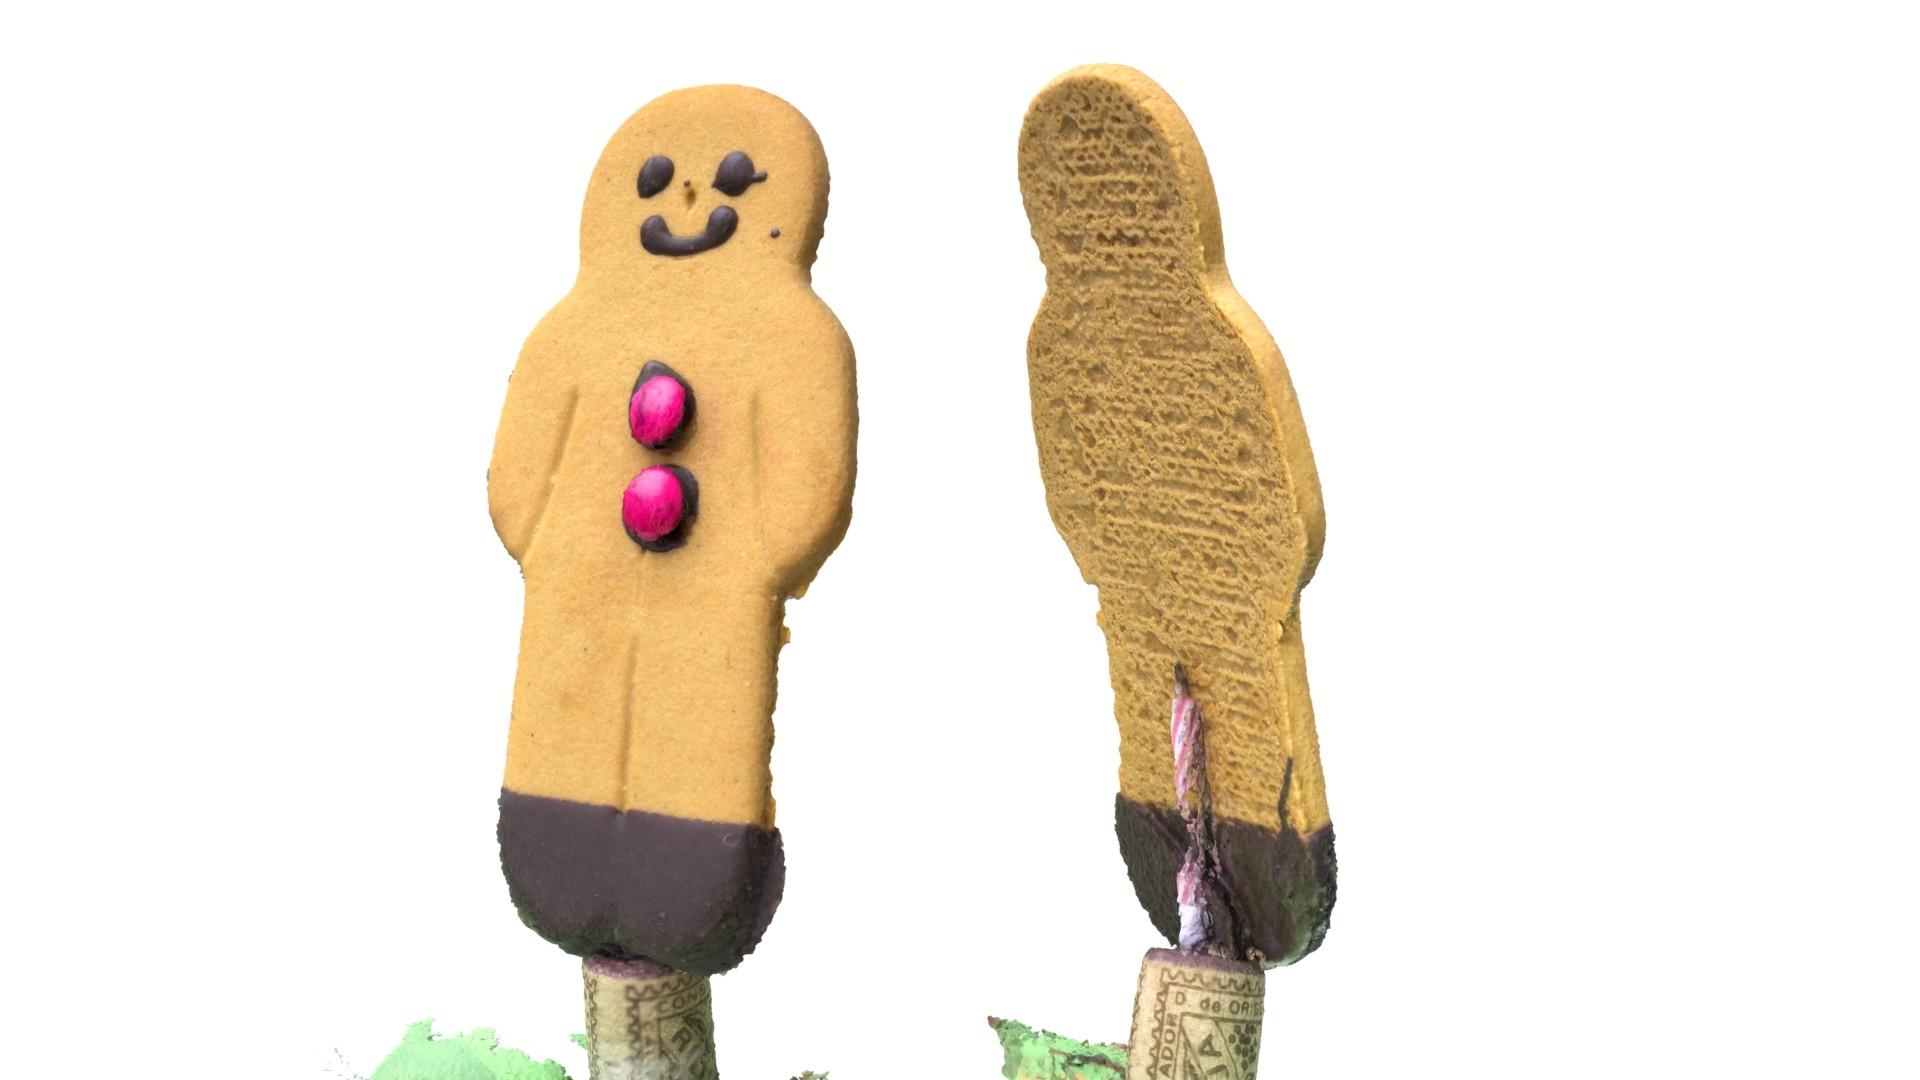 Adrian baker gingerbreadman02